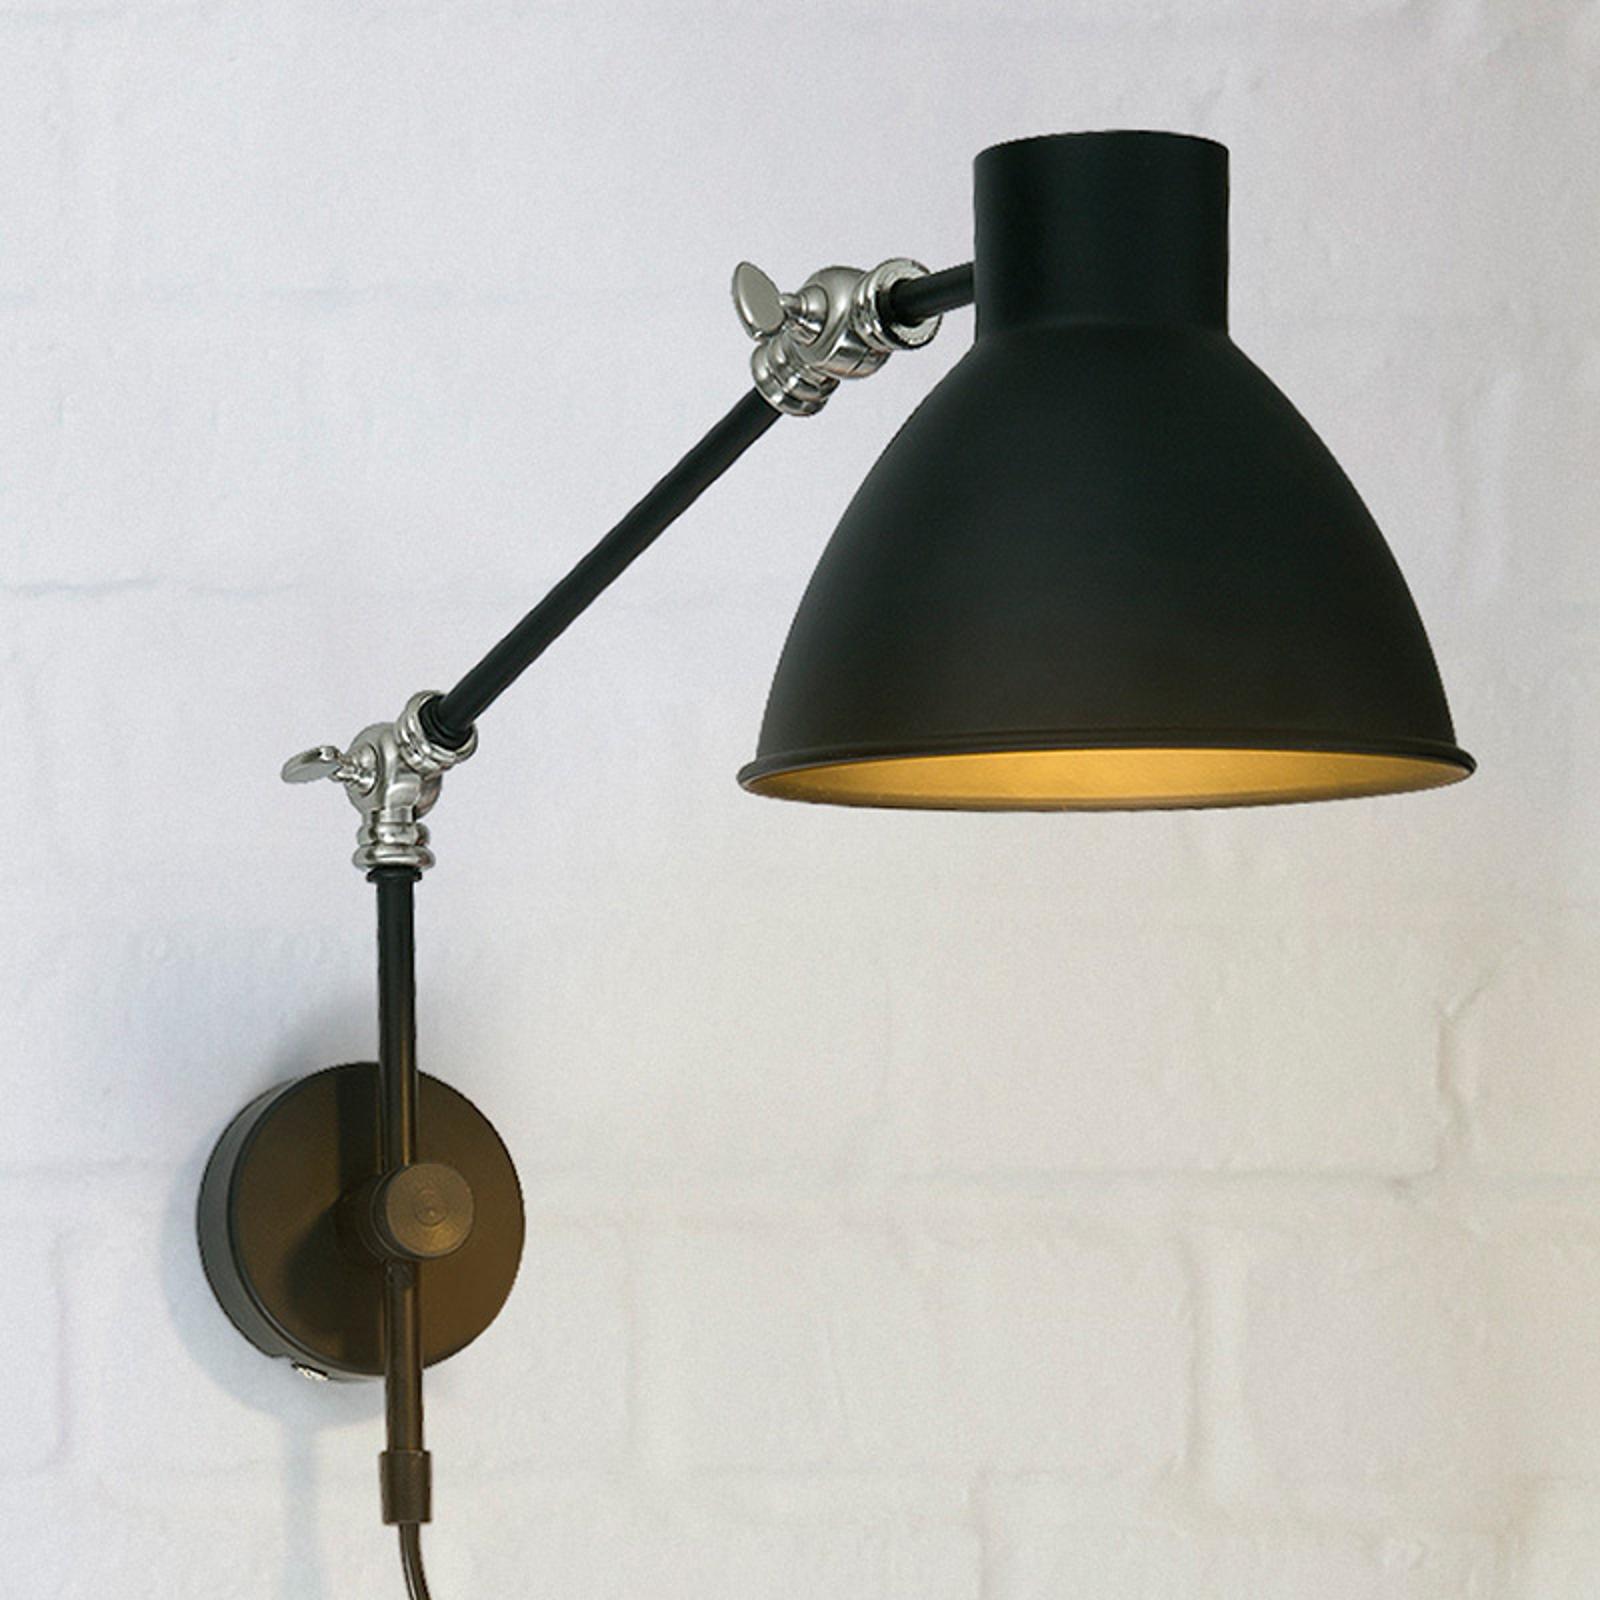 Vegglampe Celia, justerbar, svart